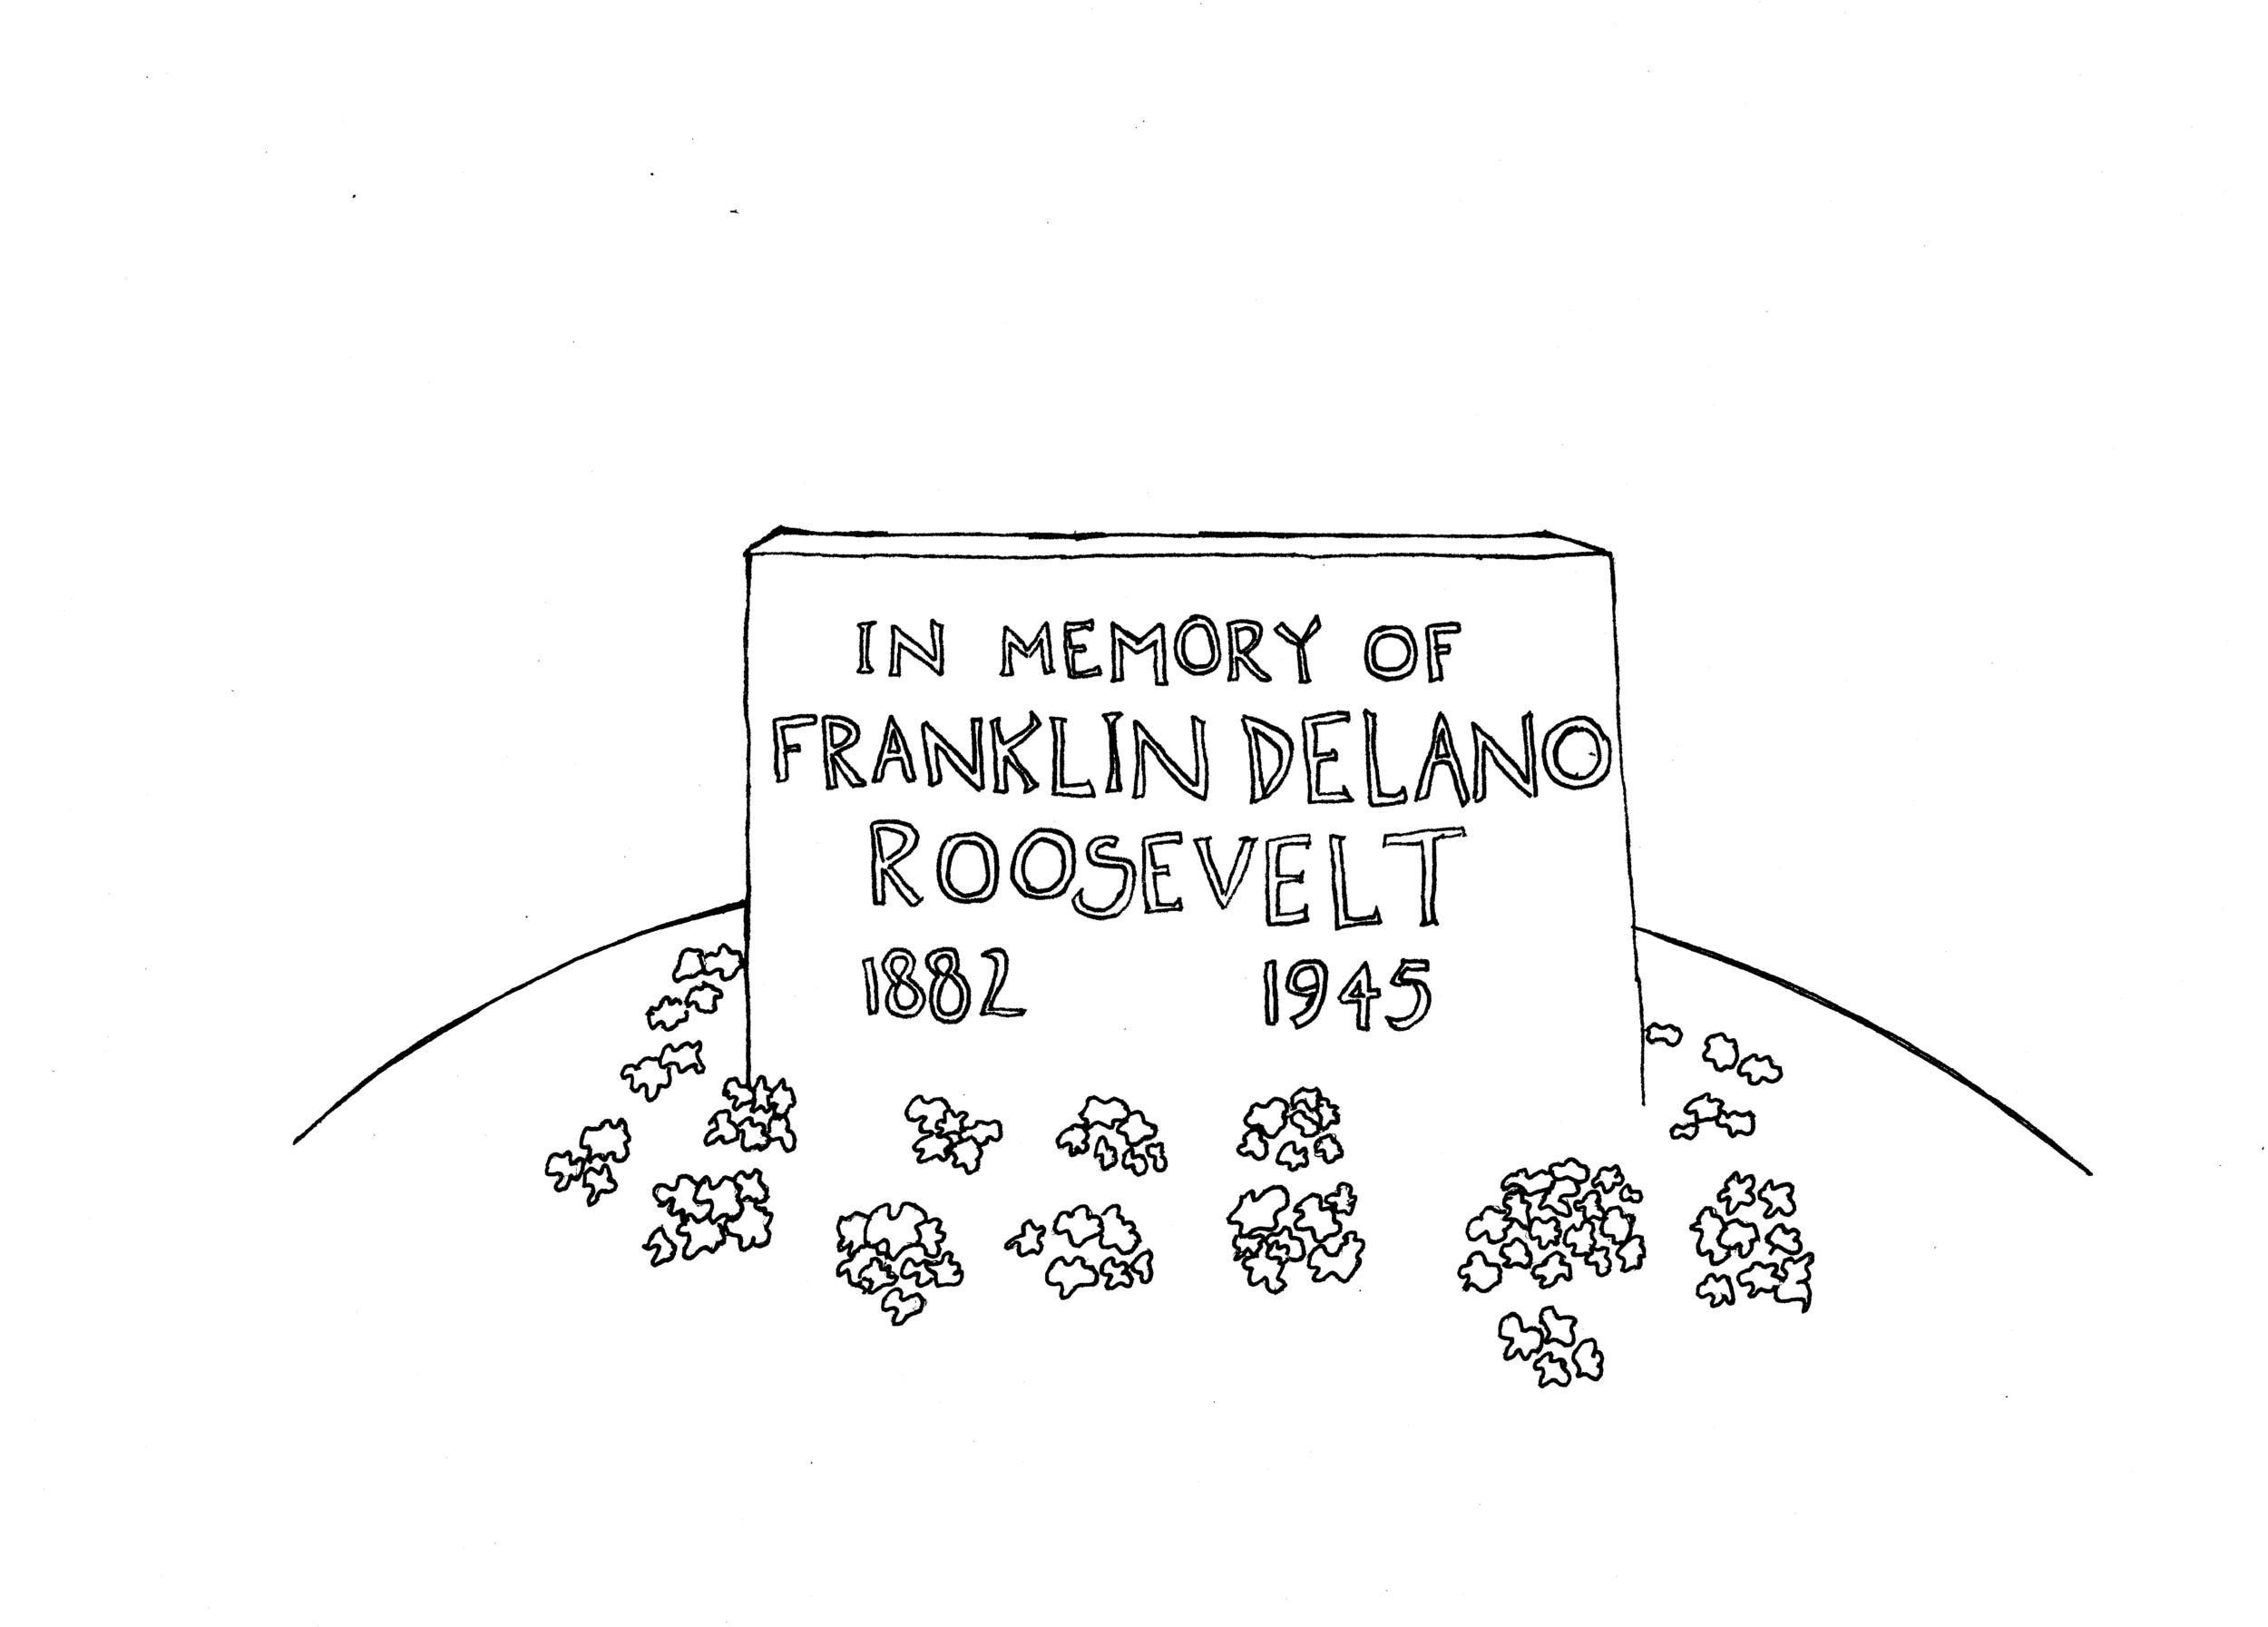 FDR Memorial copy.png